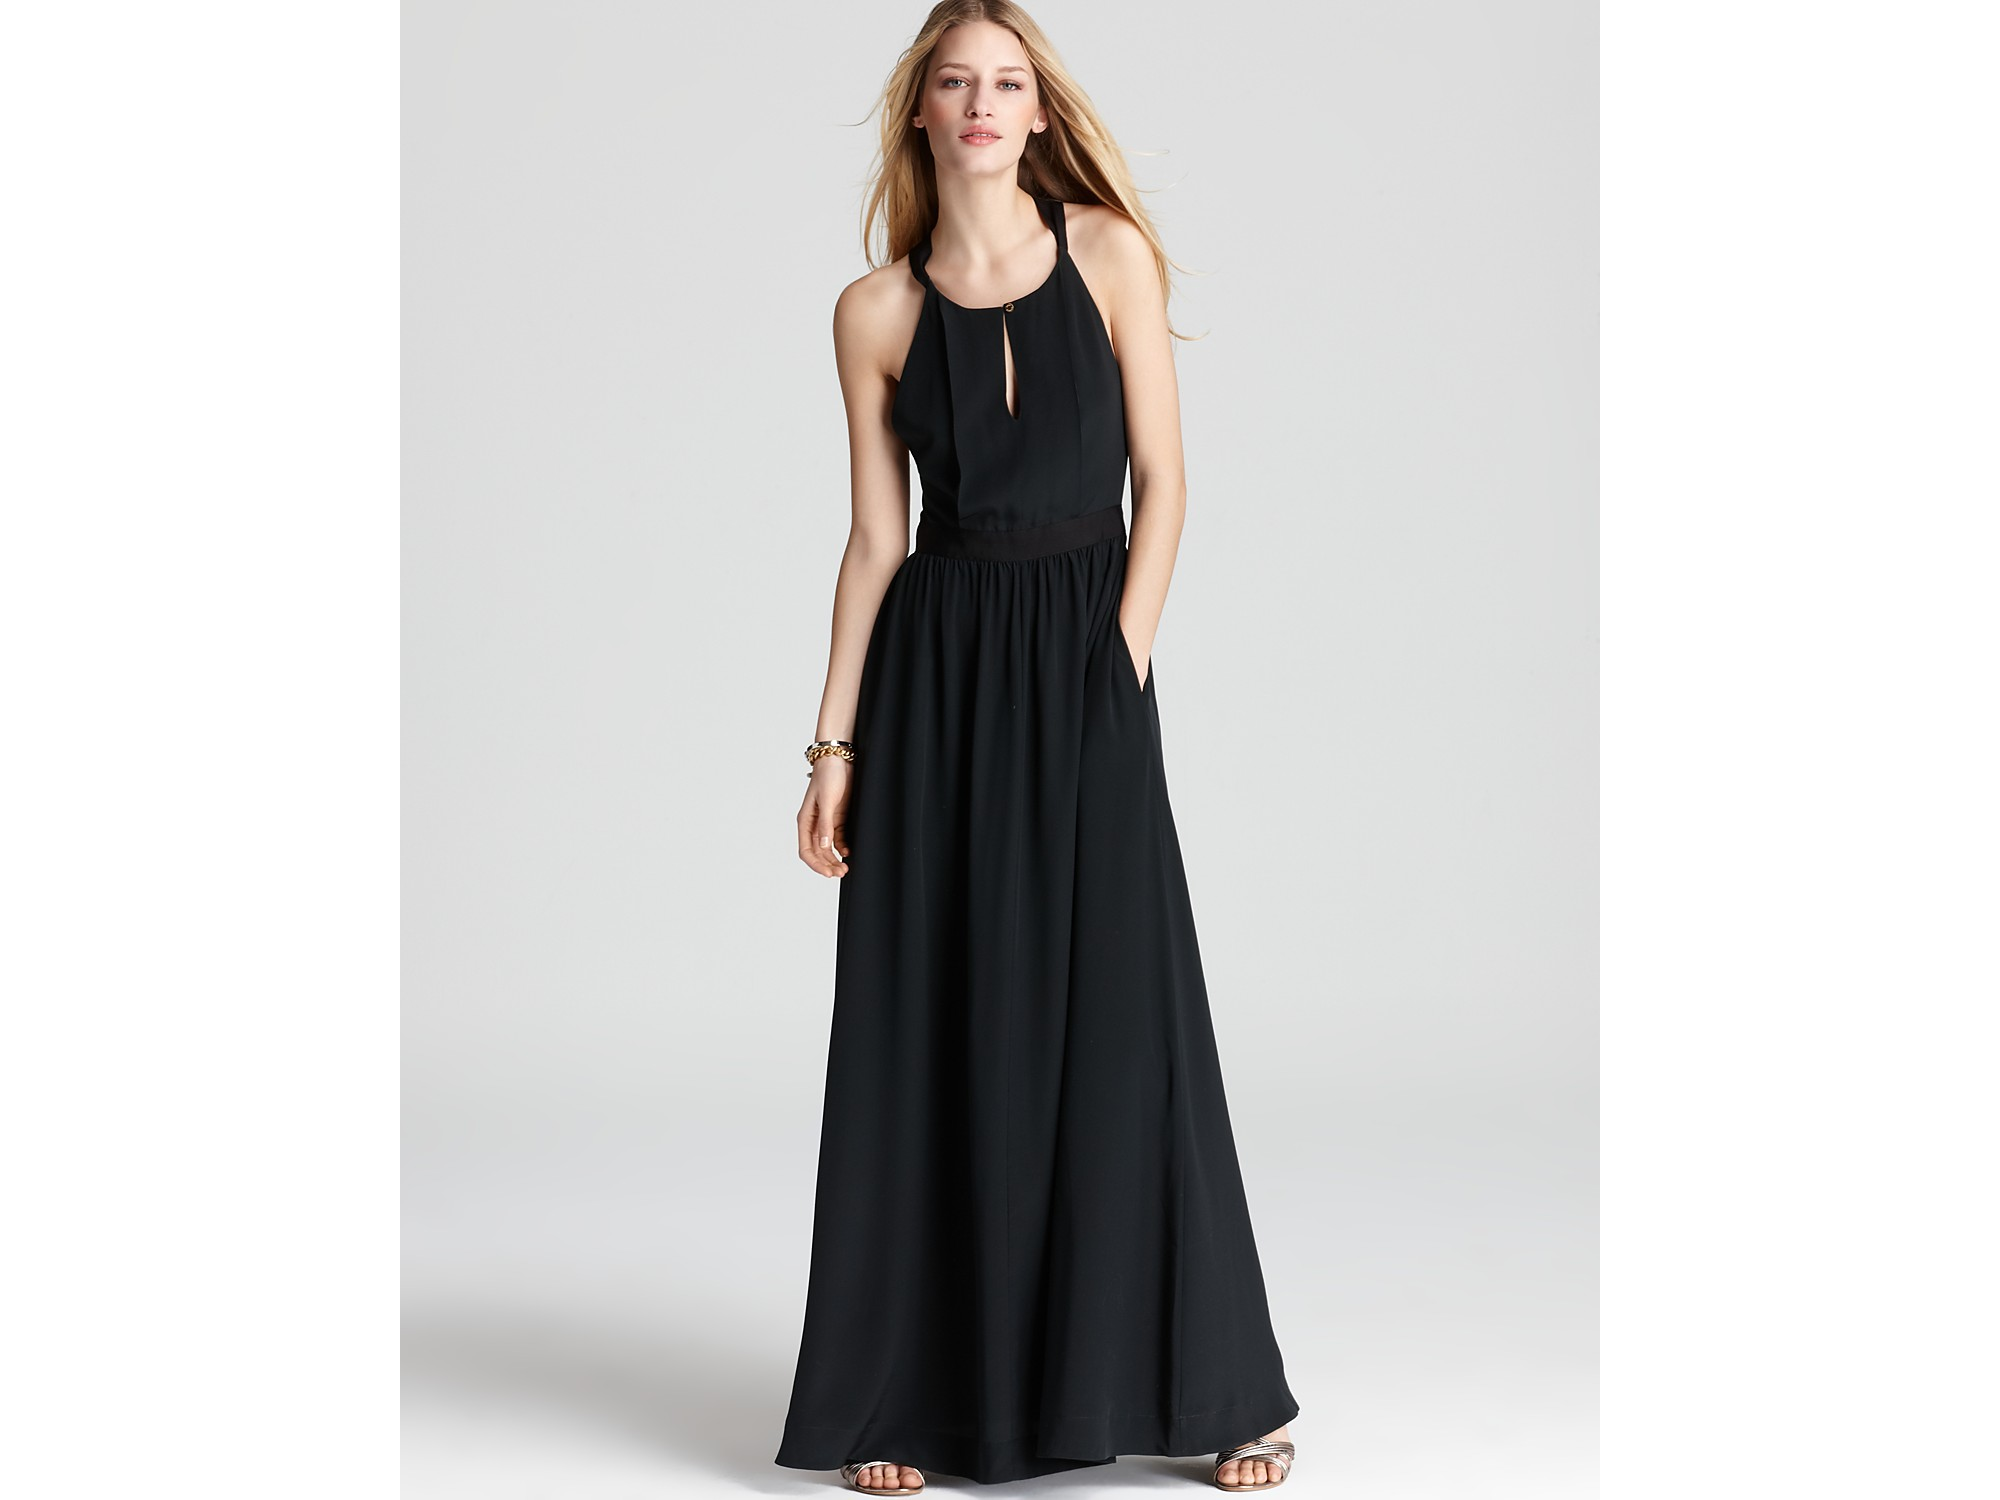 700036a5a7e8e Juicy Couture Black Easy Summer Silk Maxi Dress